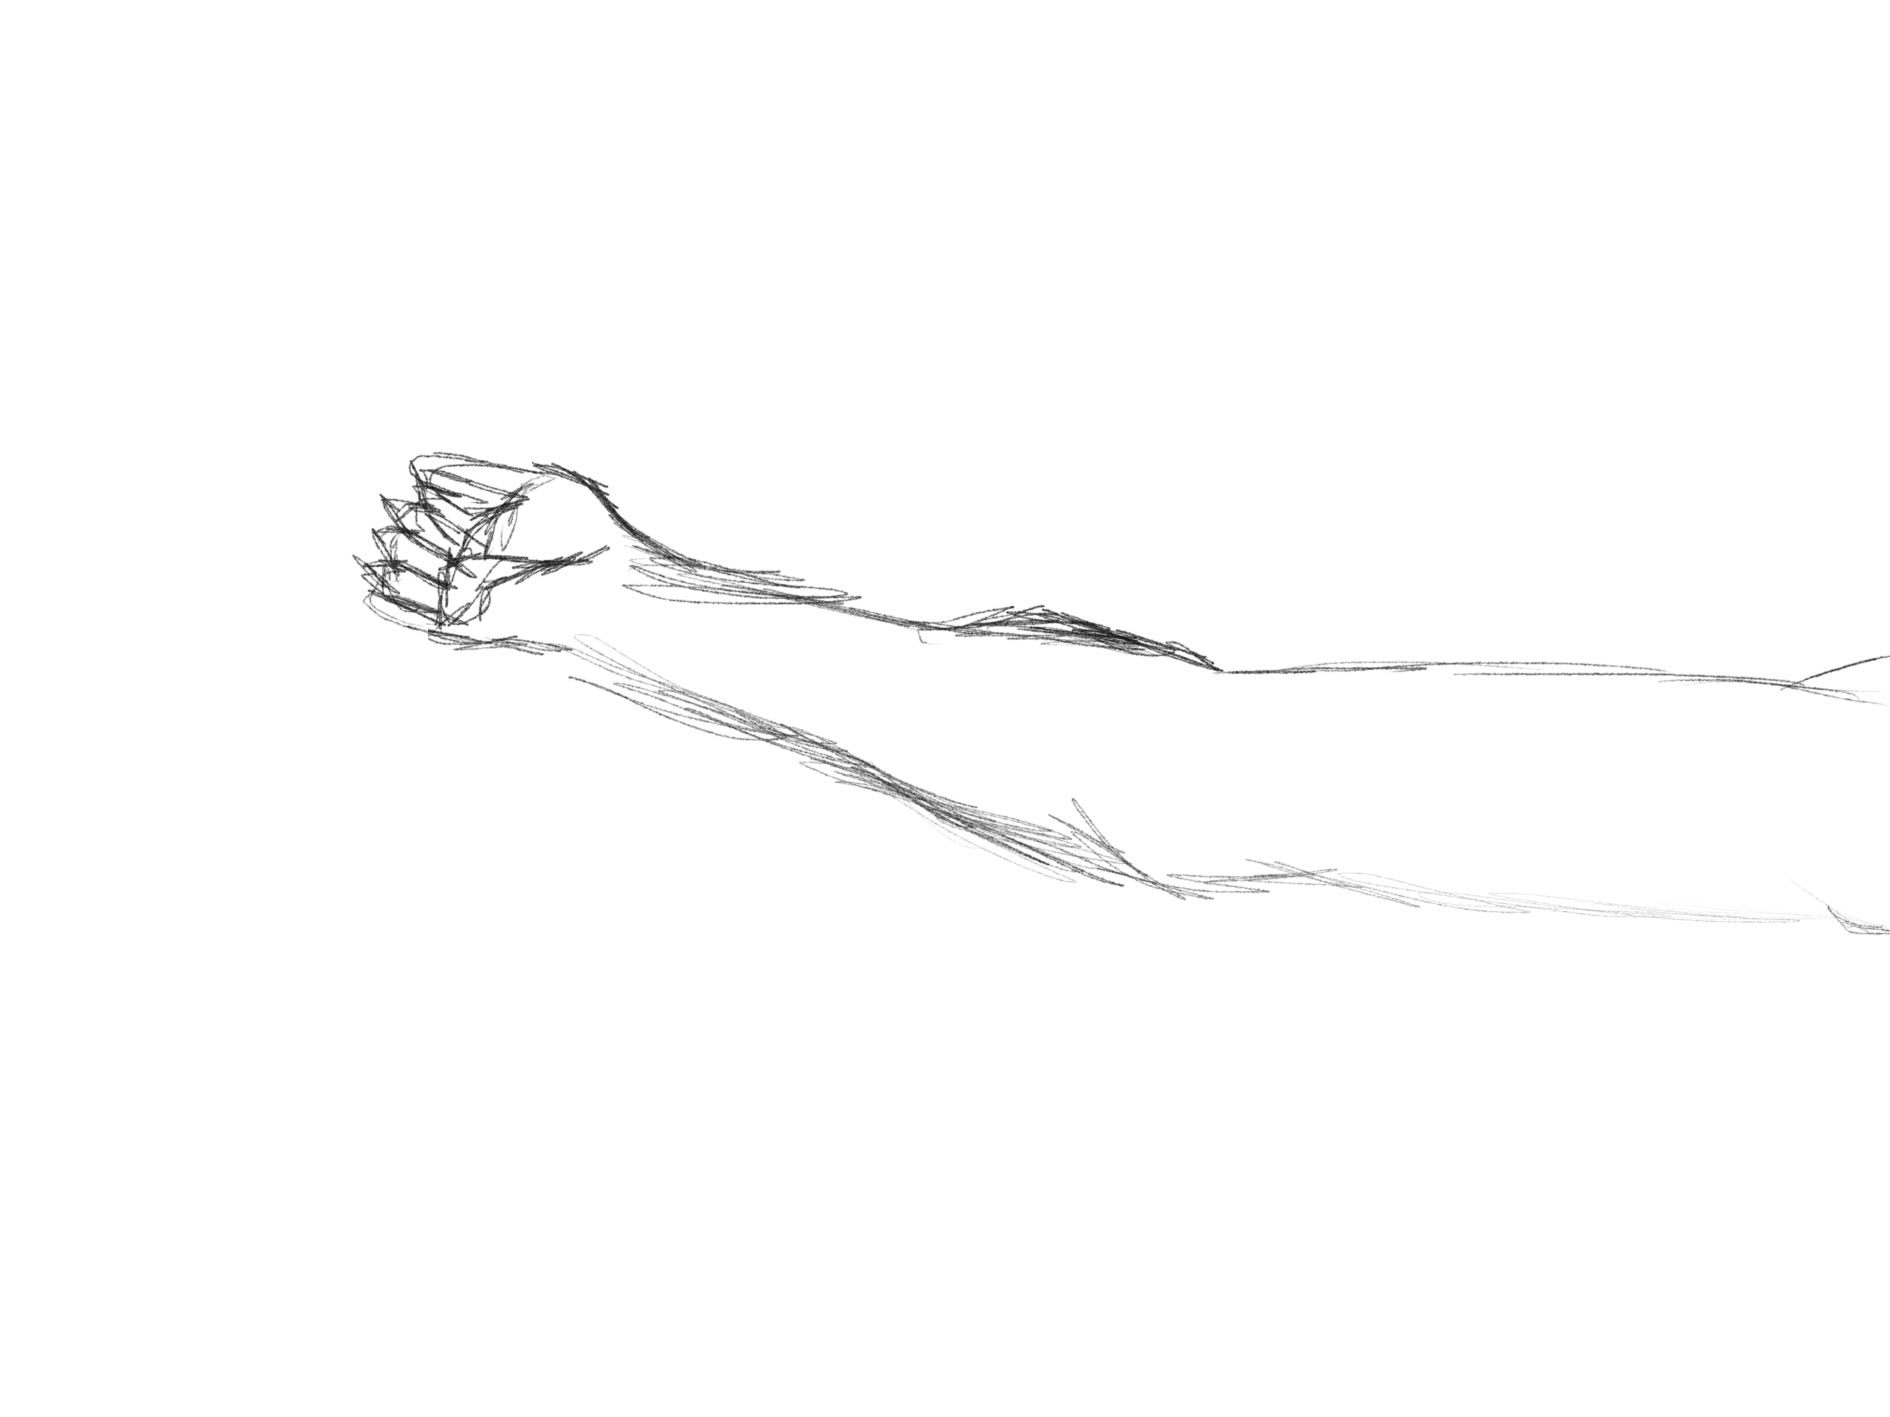 Need help to draw